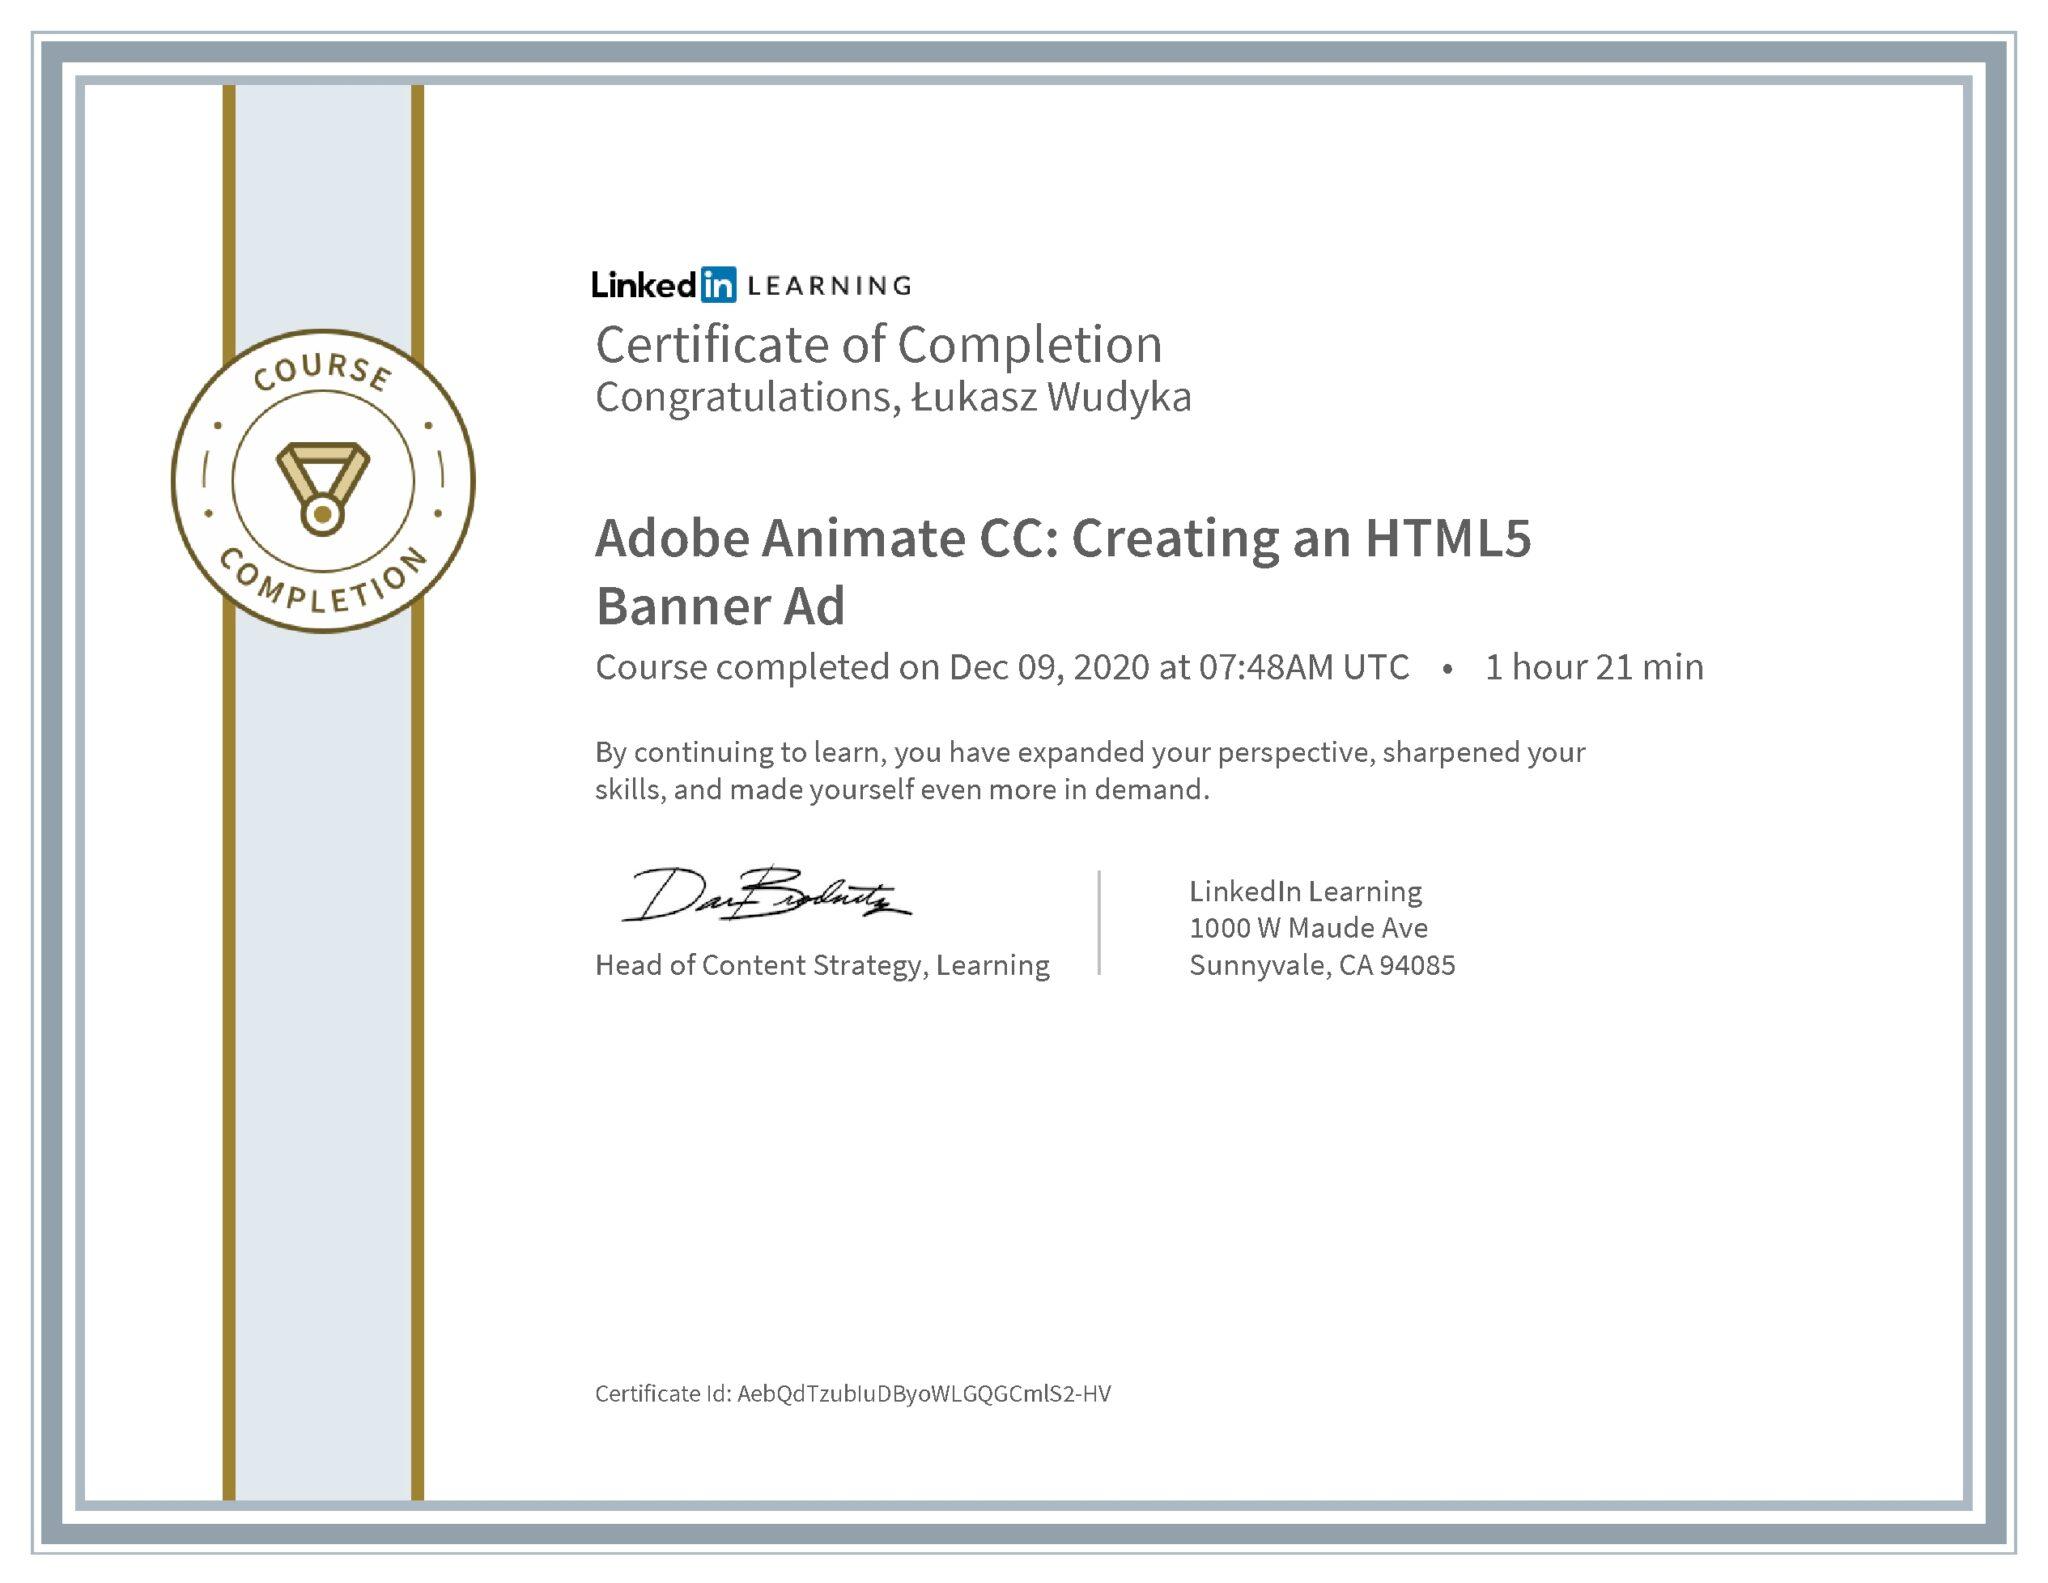 Łukasz Wudyka certyfikat LinkedIn Adobe Animate CC: Creating an HTML5 Banner Ad